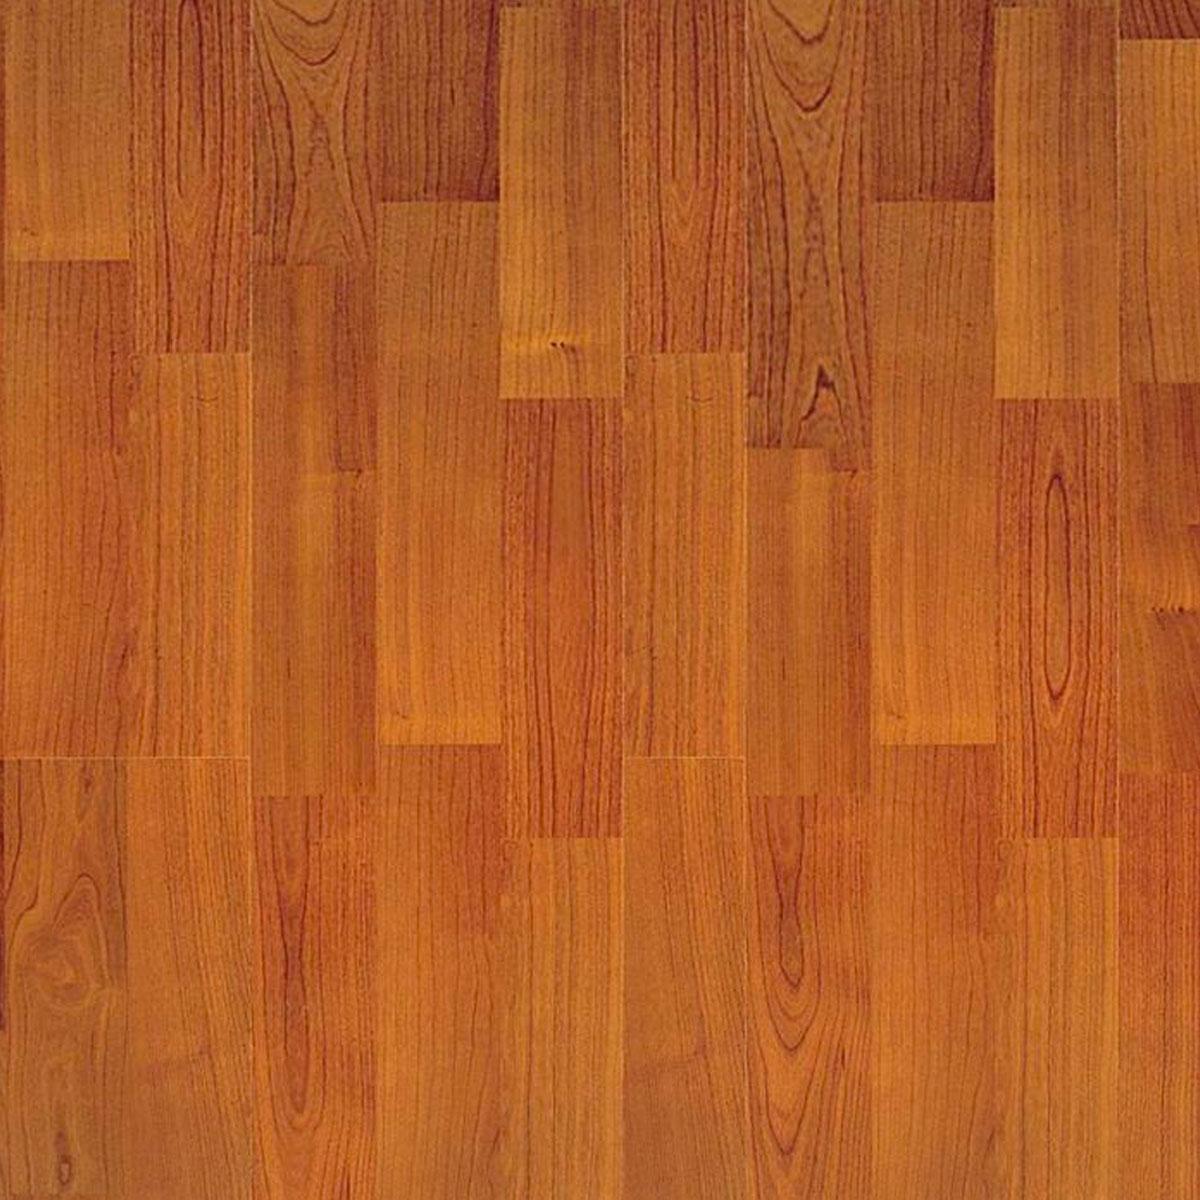 Lifestyle Floors Kensington Autumn, Superior Quality Laminate Flooring